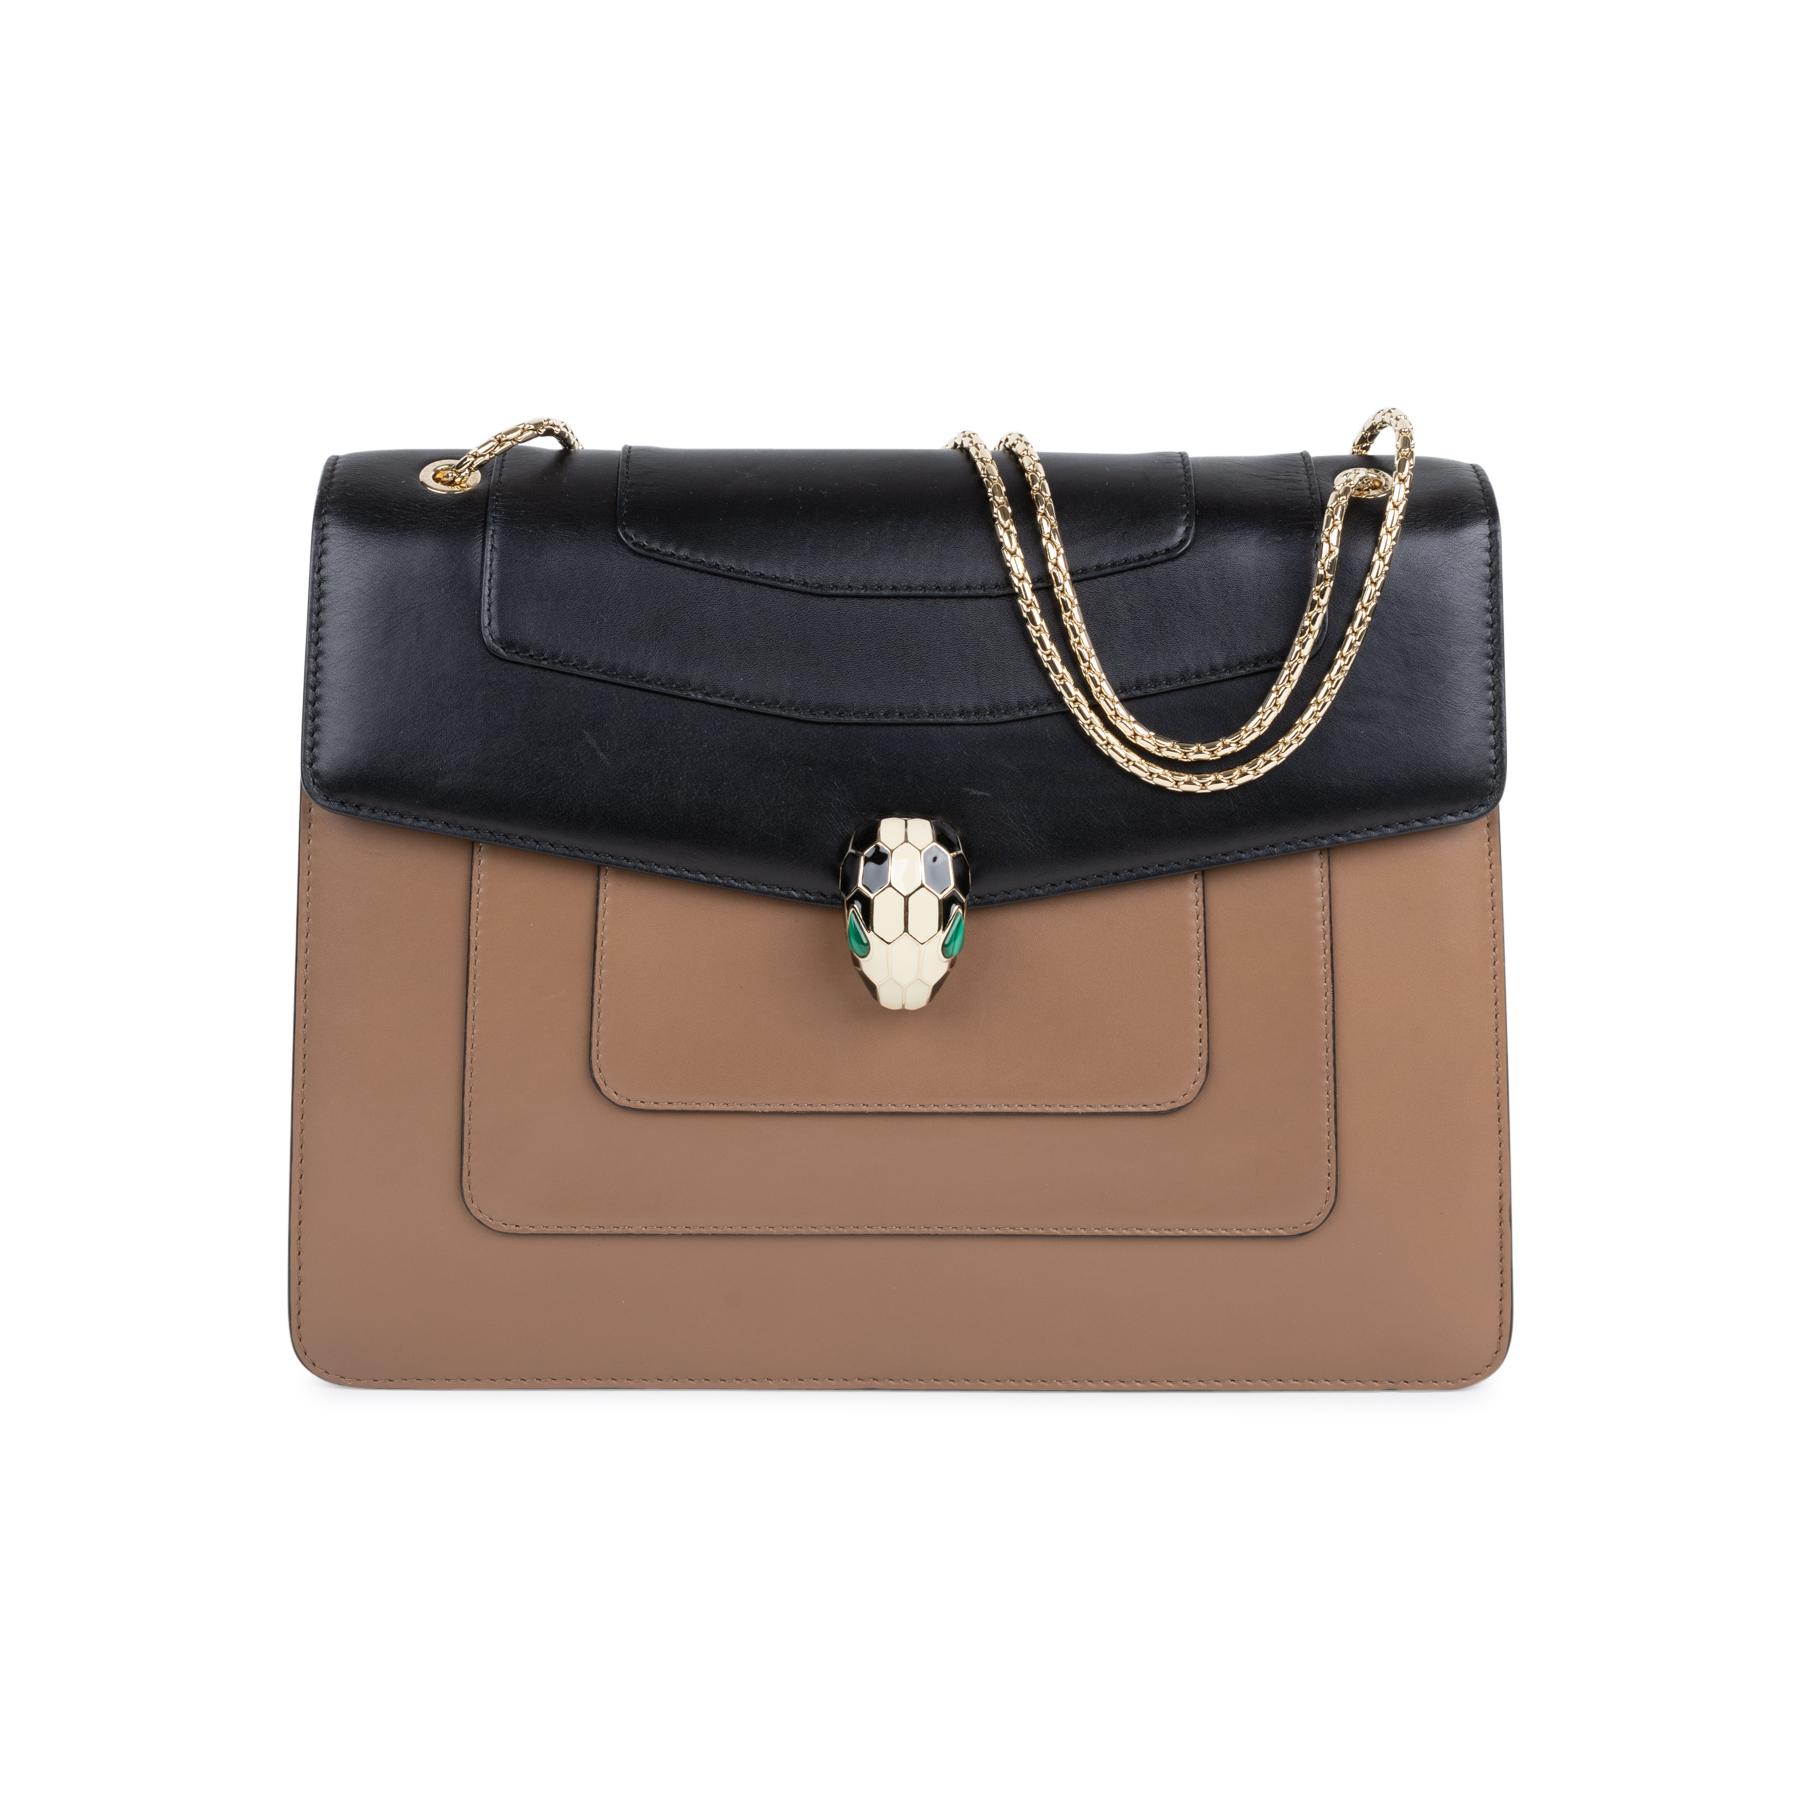 0e2227b07740 Authentic Second Hand Bulgari Serpenti Forever Flap Bag (PSS-569-00001)